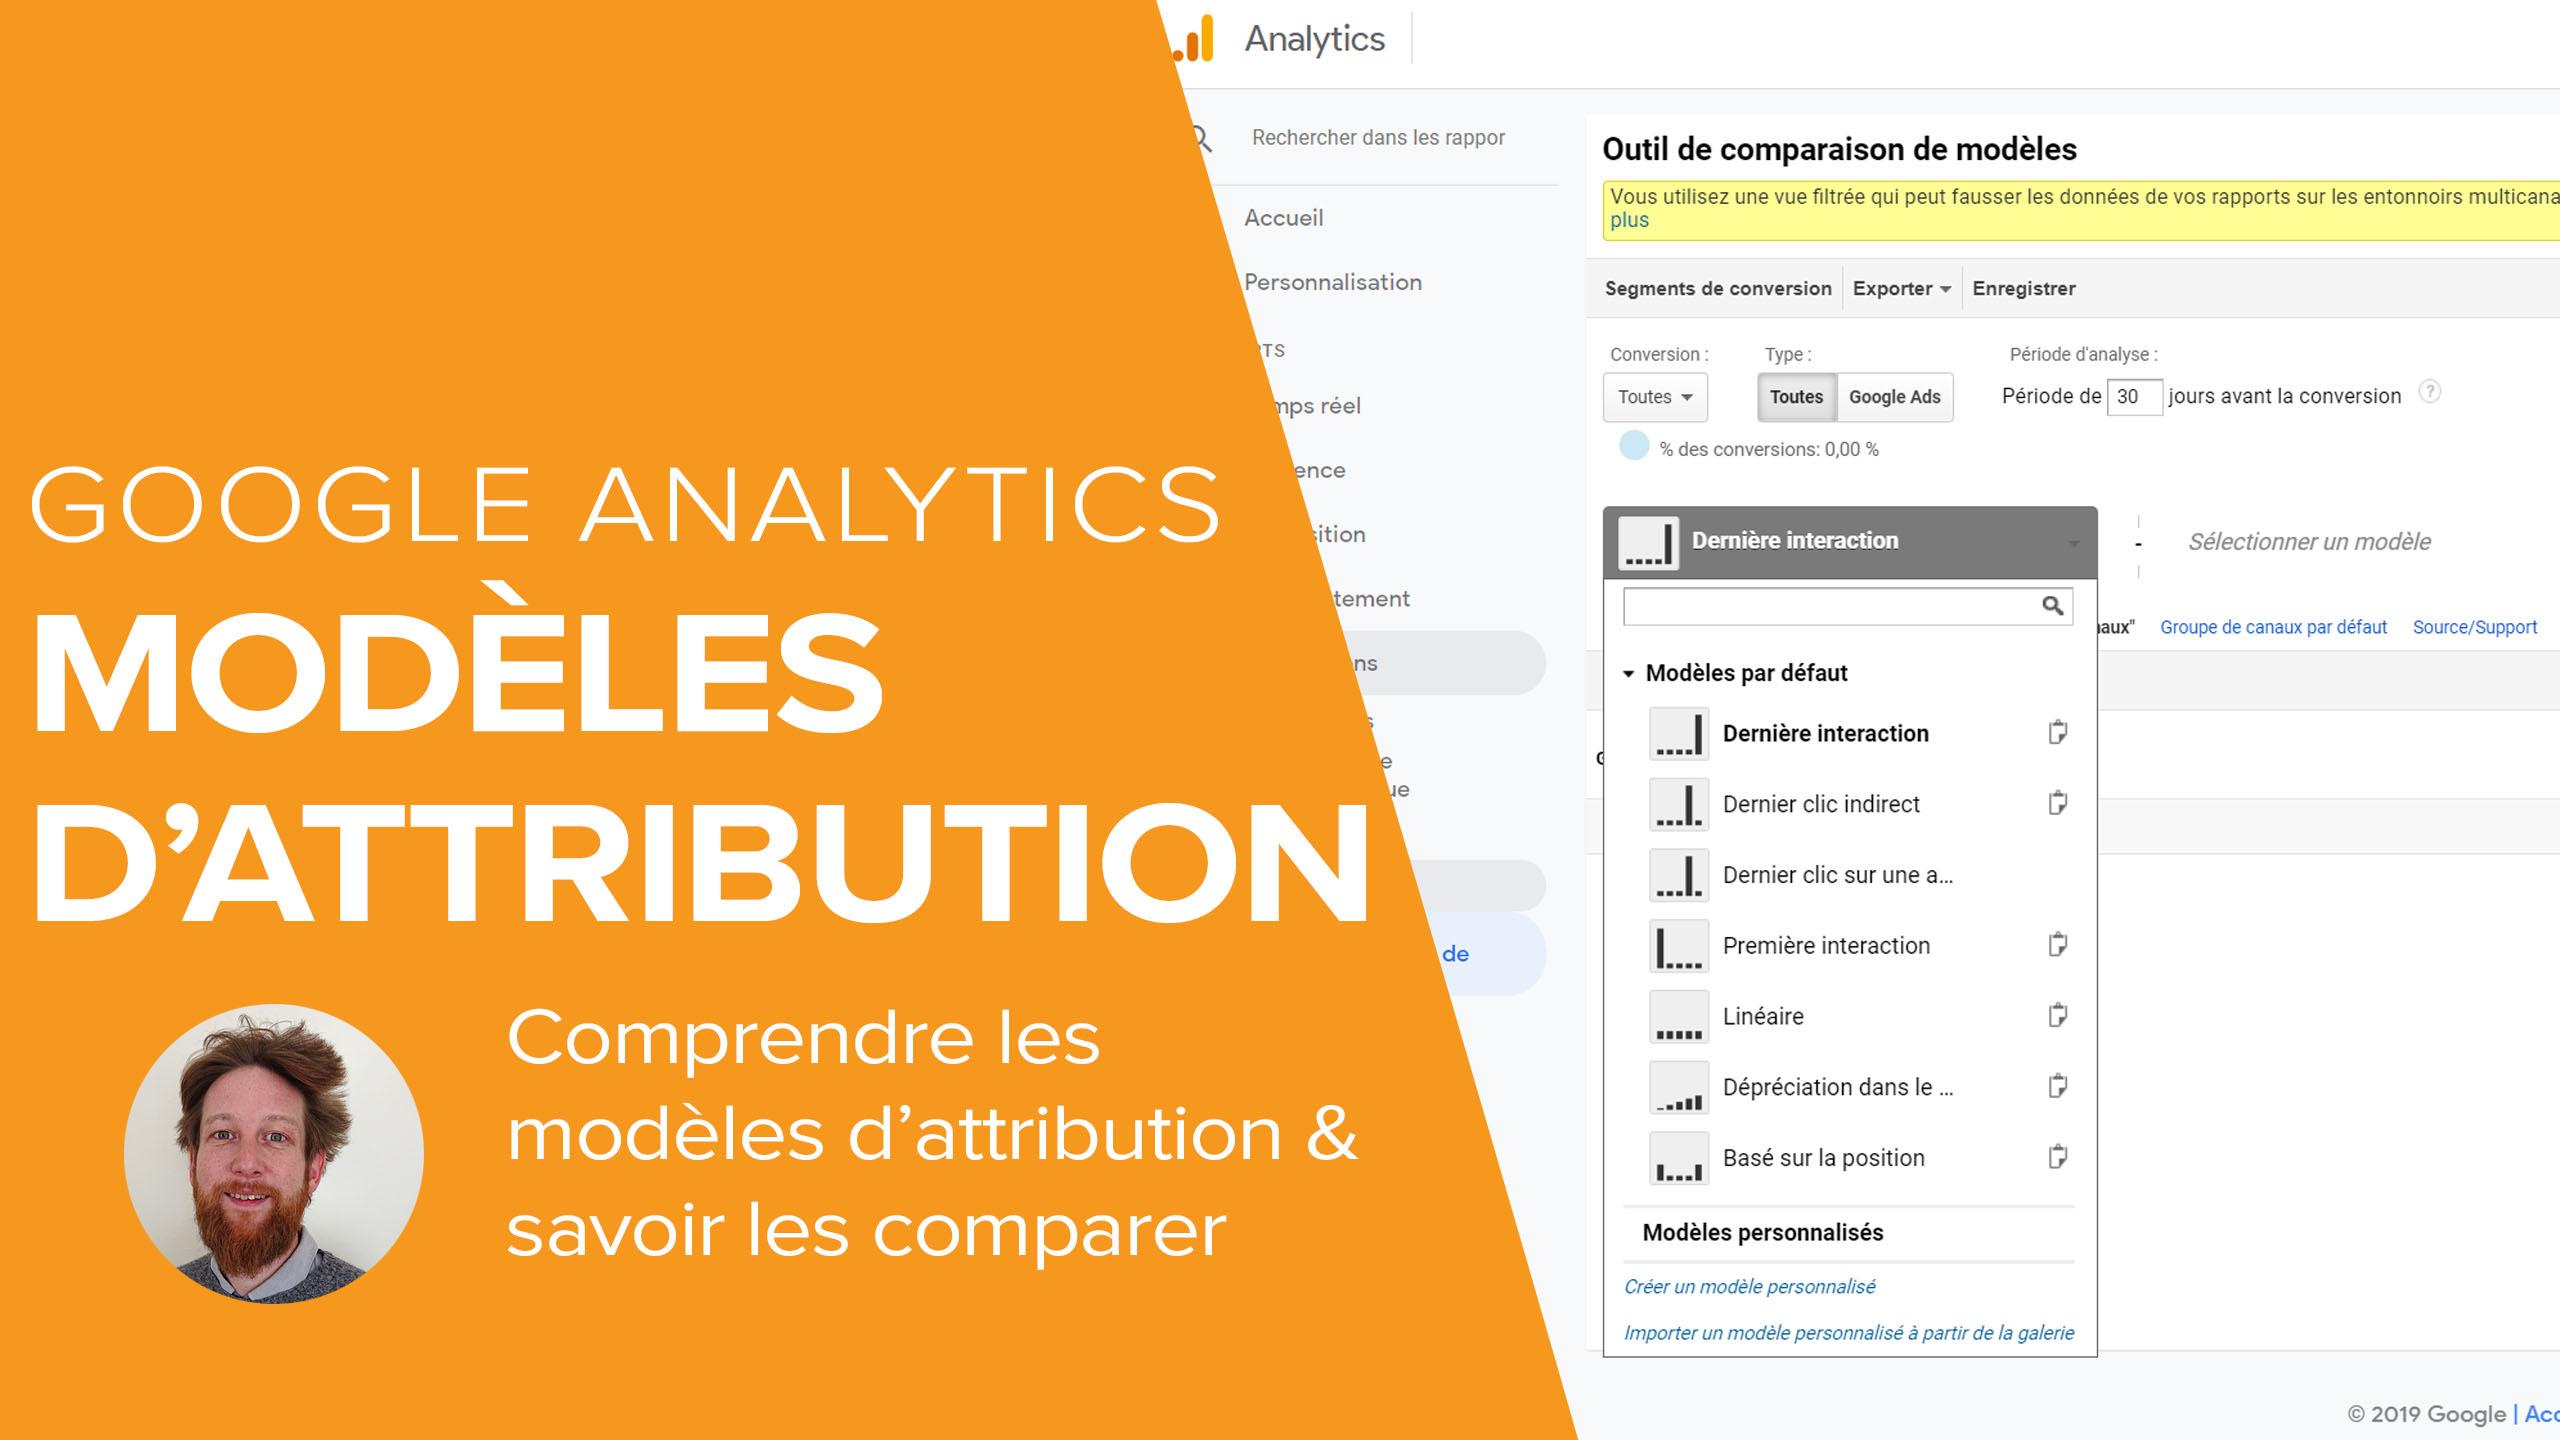 Modèles d'attribution Google Analytics : Comprendre et comparer